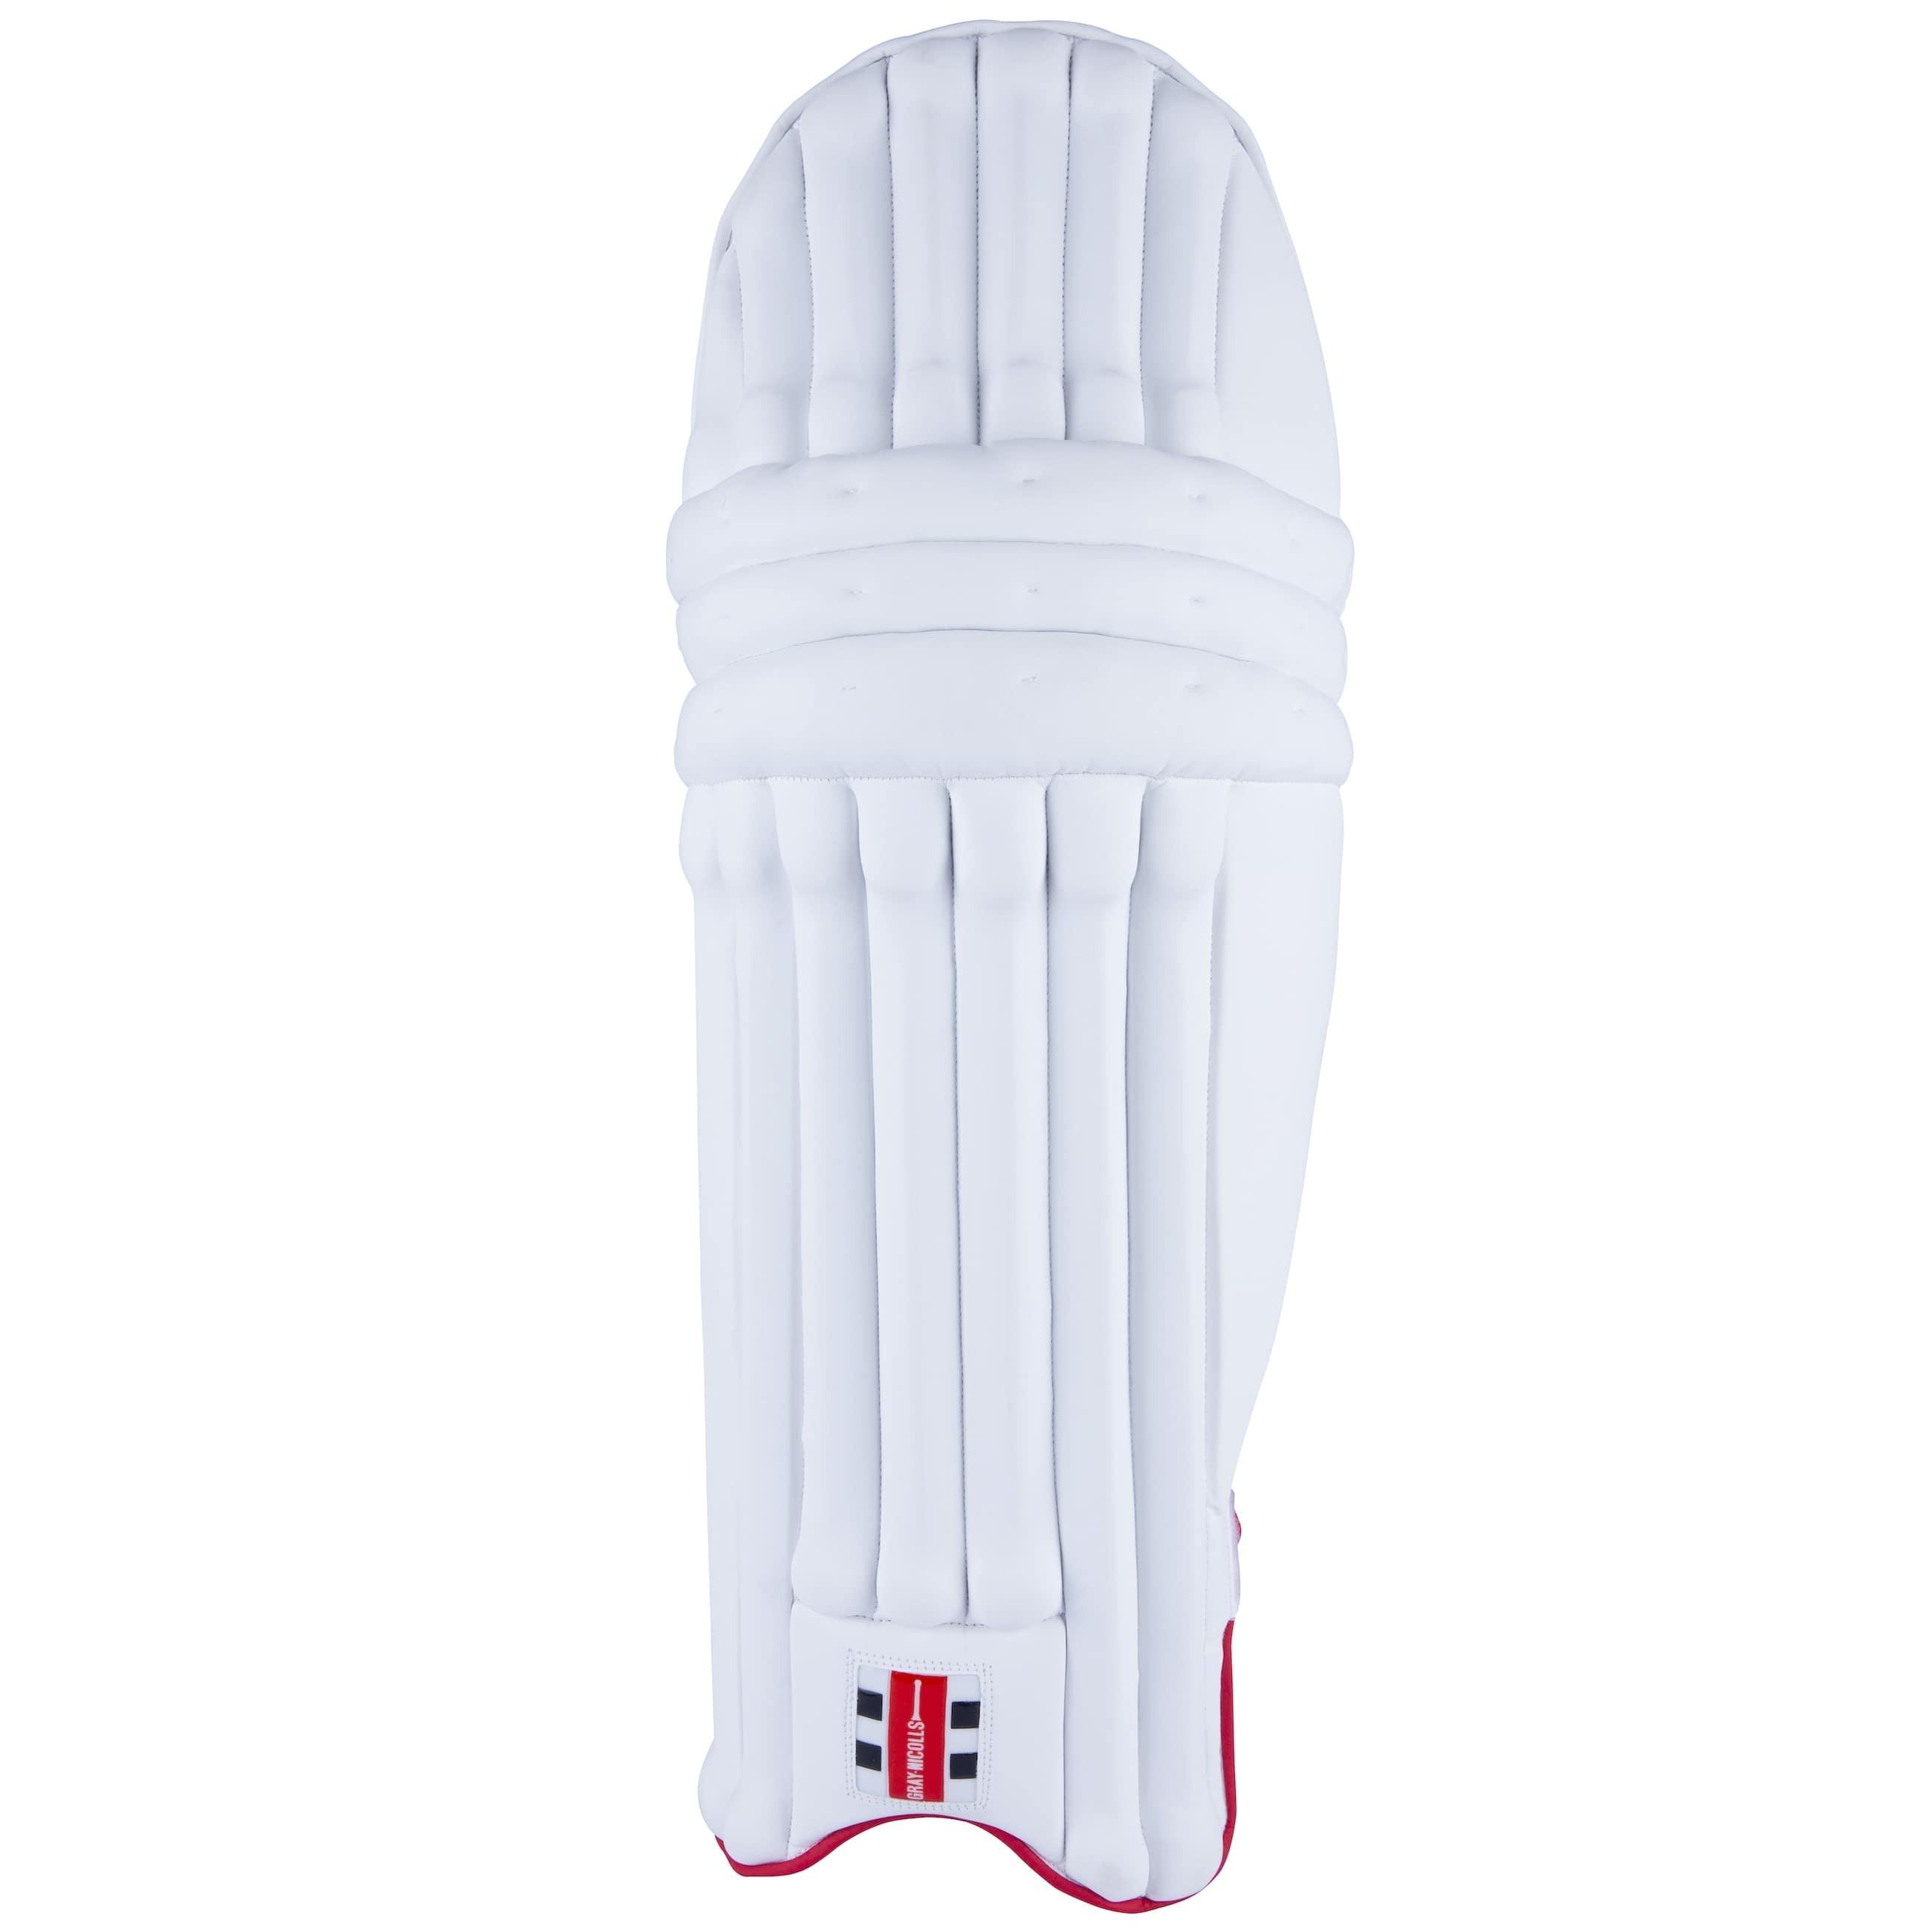 2021 Gray Nicolls Original Test 1500 Batting Pads